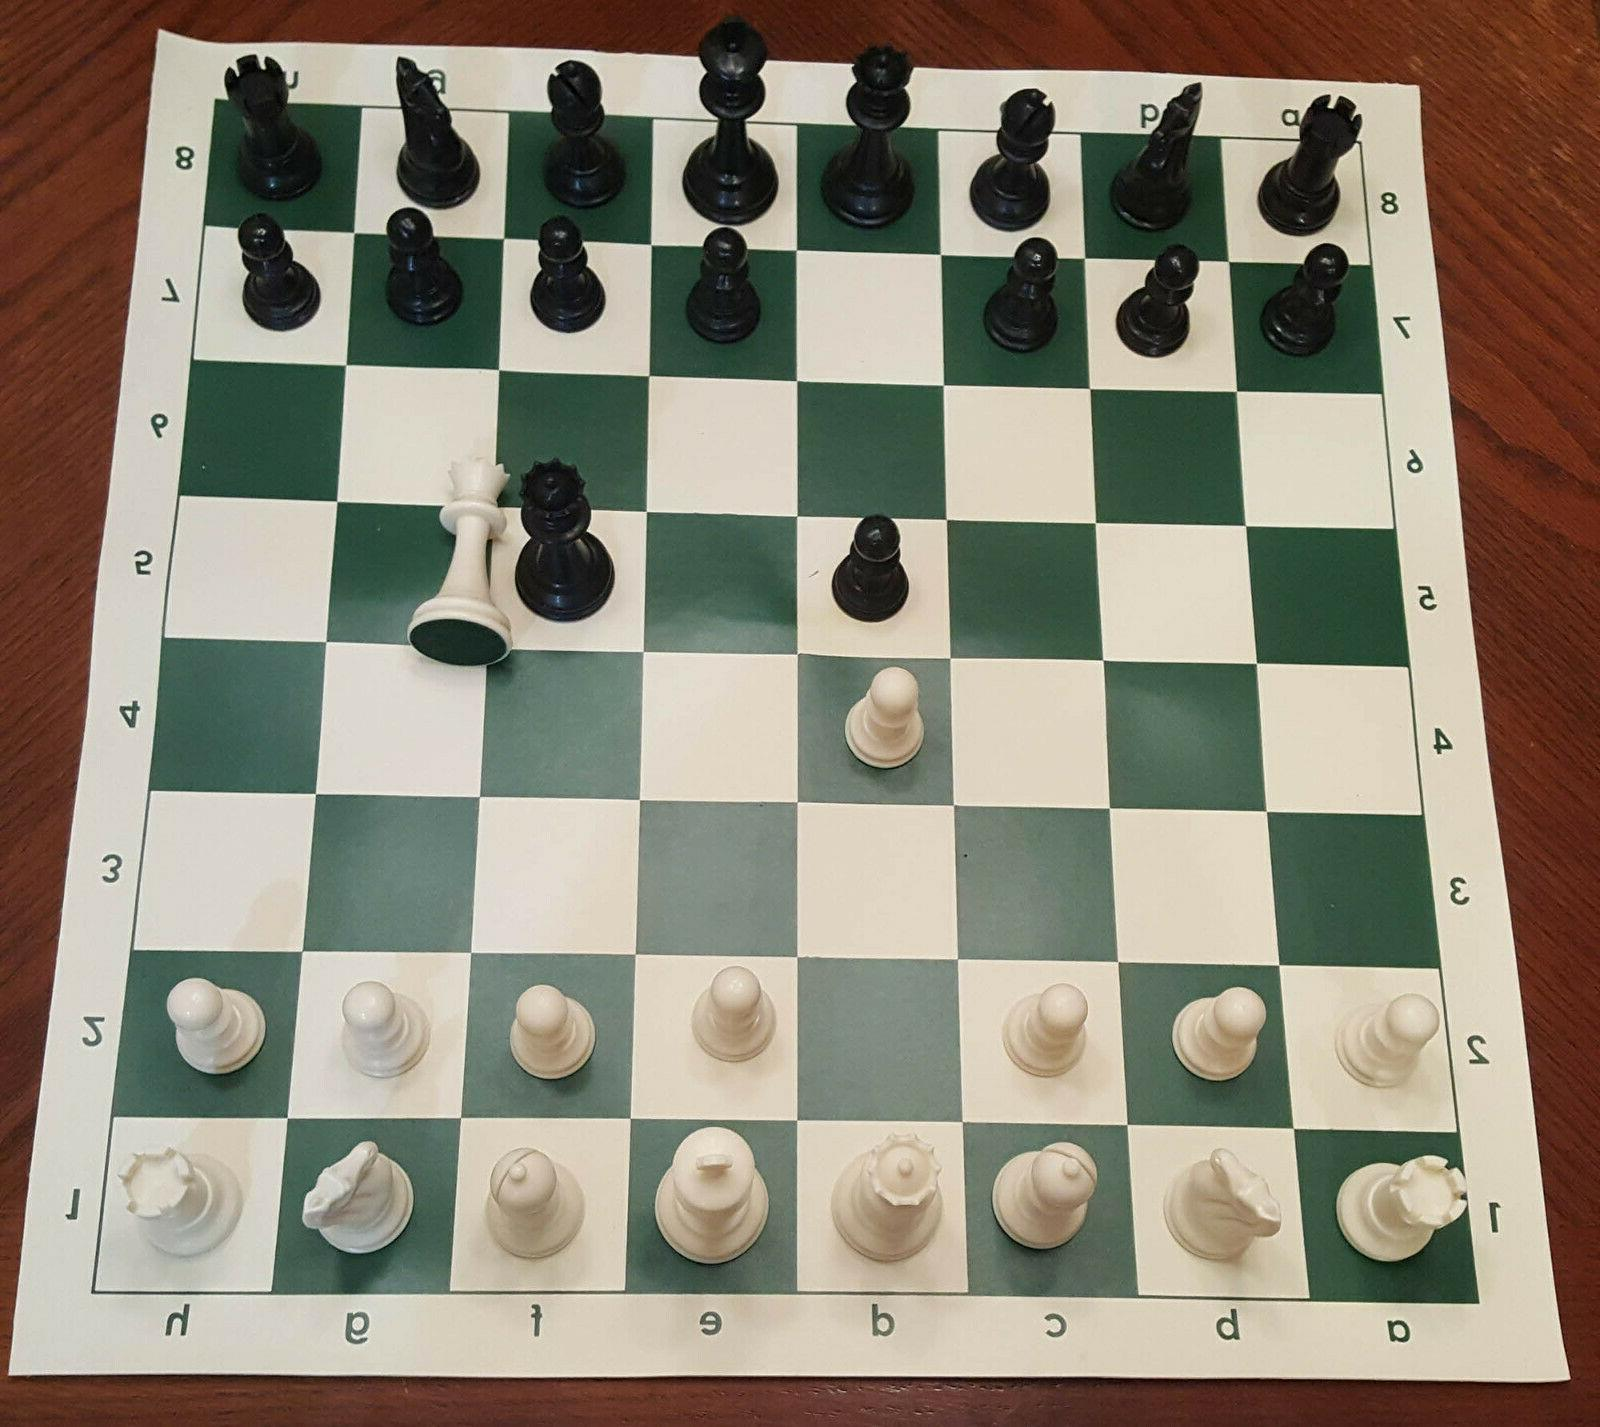 new tournament chess set basic plastic pieces